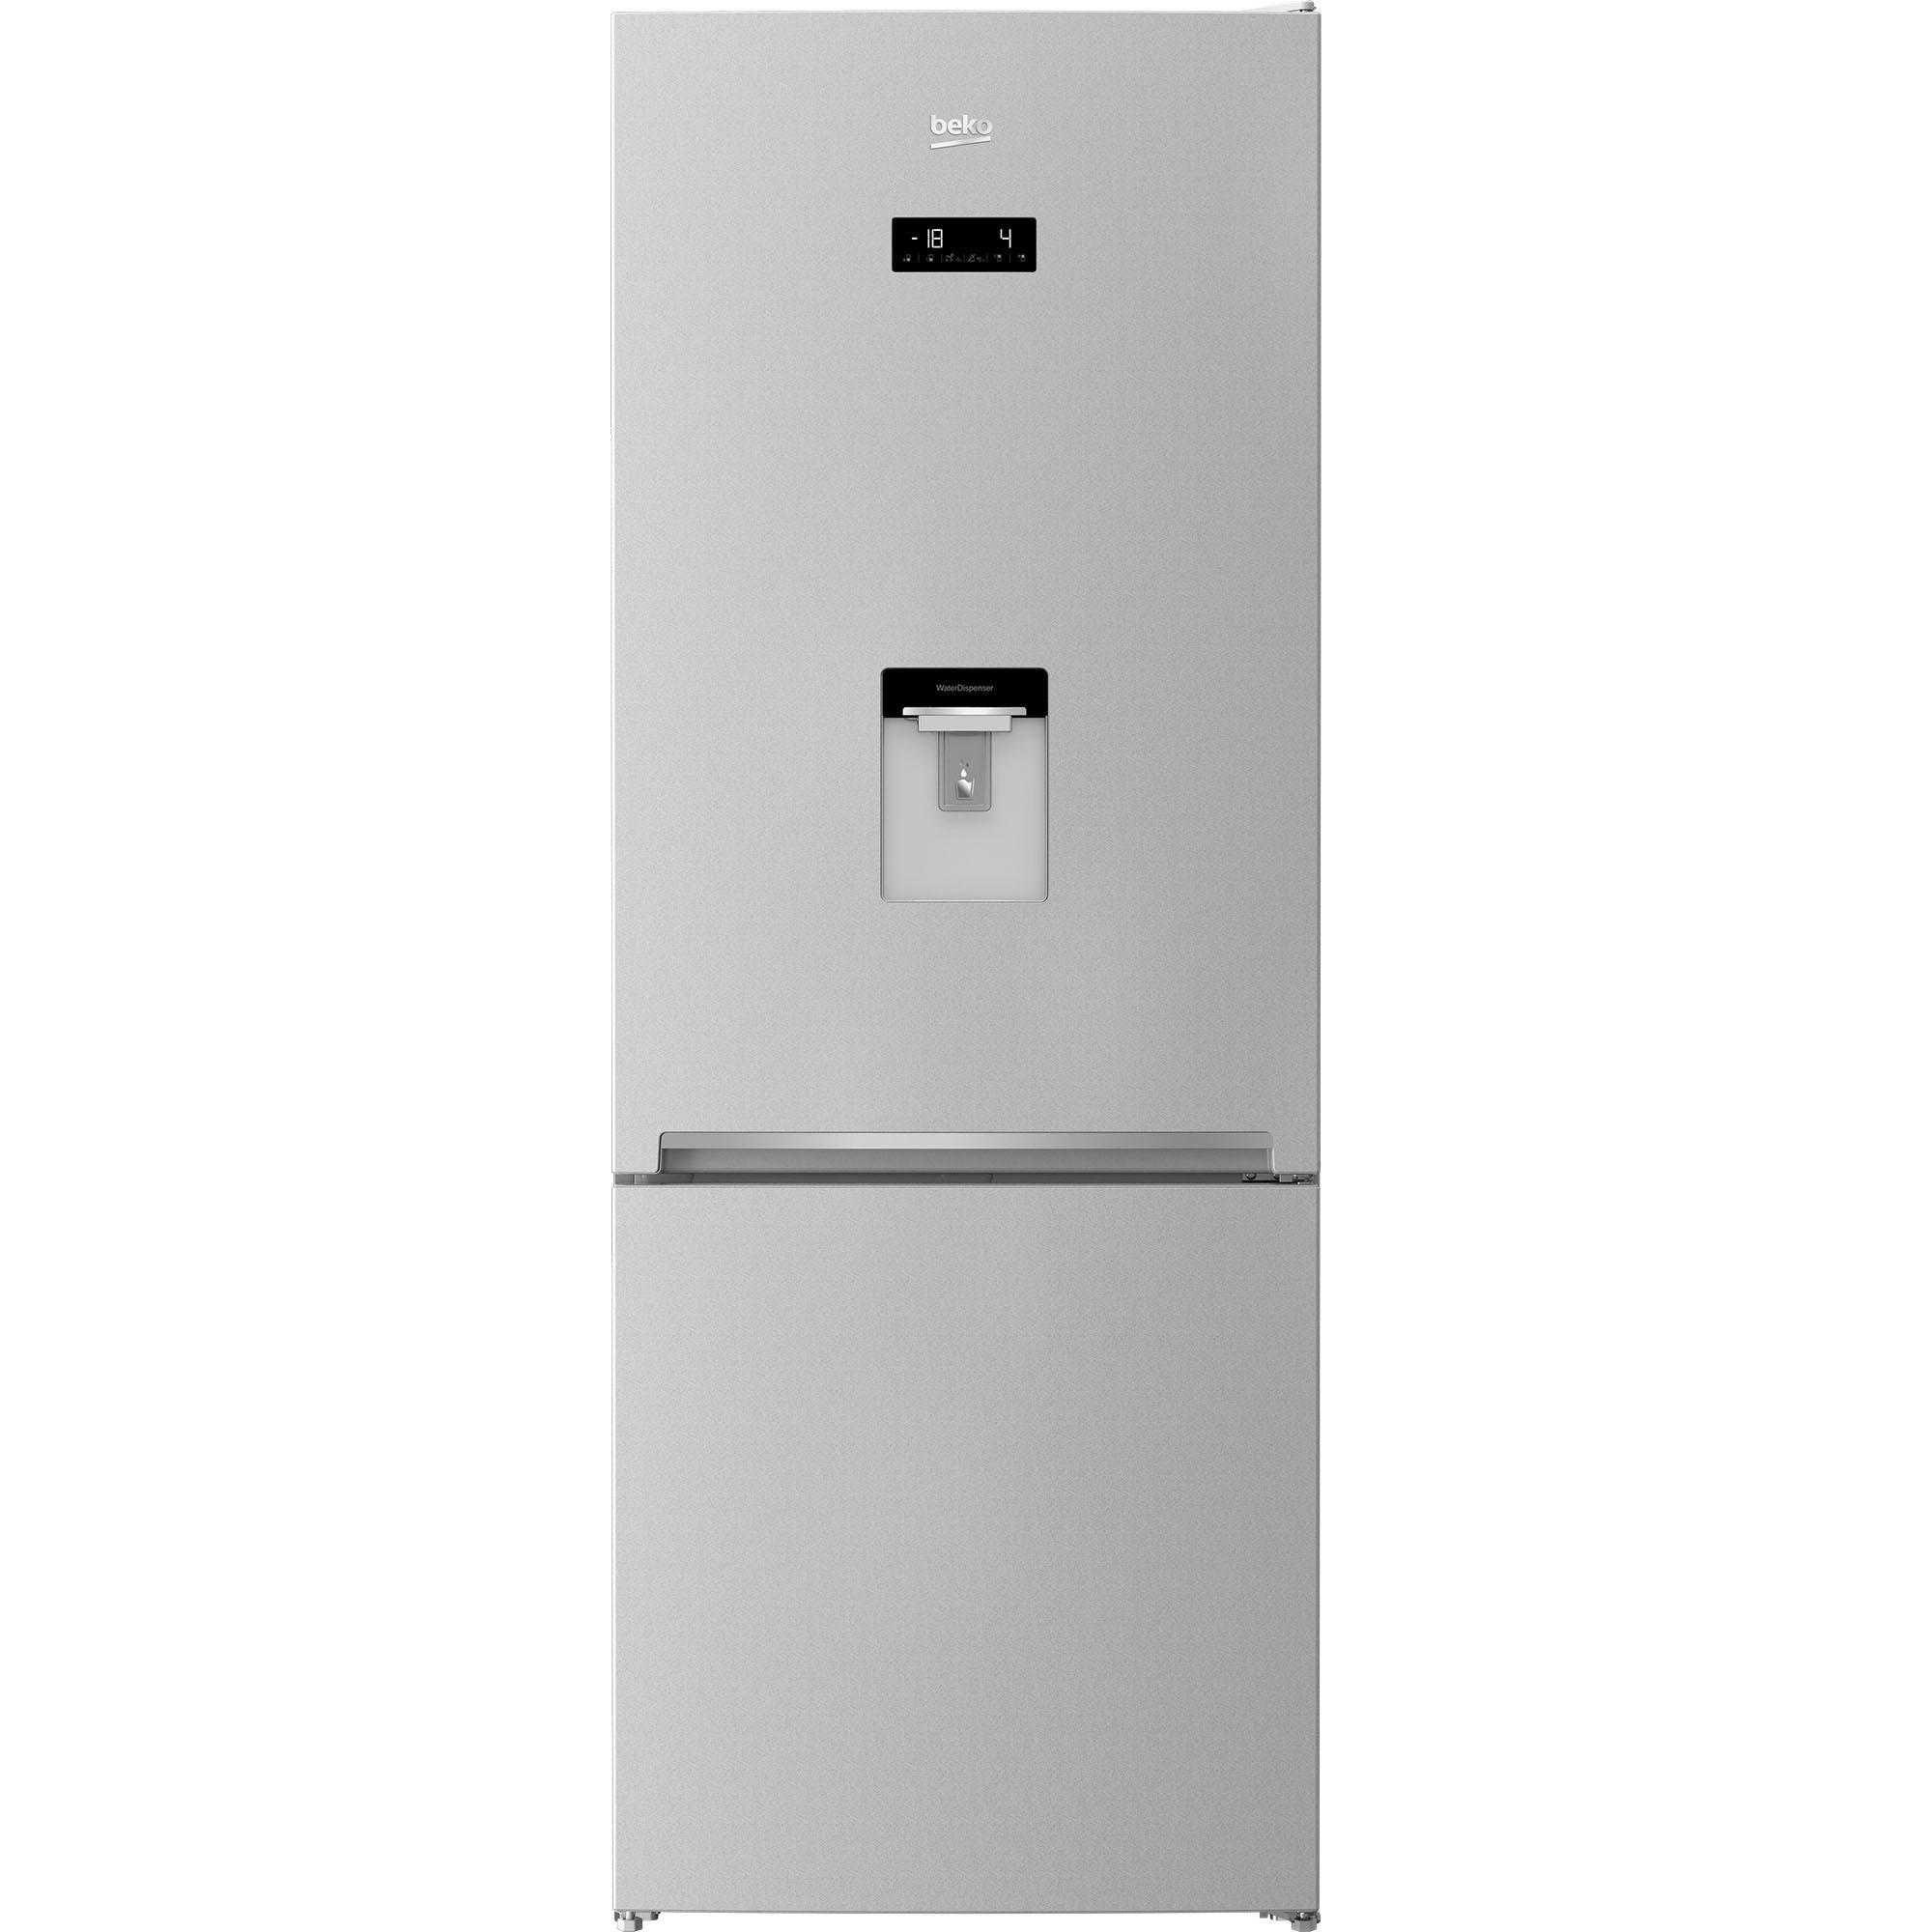 Fotografie Combina frigorifica Beko RCNE560E40DZMN, 497 l, NeoFrost Dual Cooling, HarvestFresh, EverFresh, Dozator de apa, Clasa A++, H 192 cm, Gri